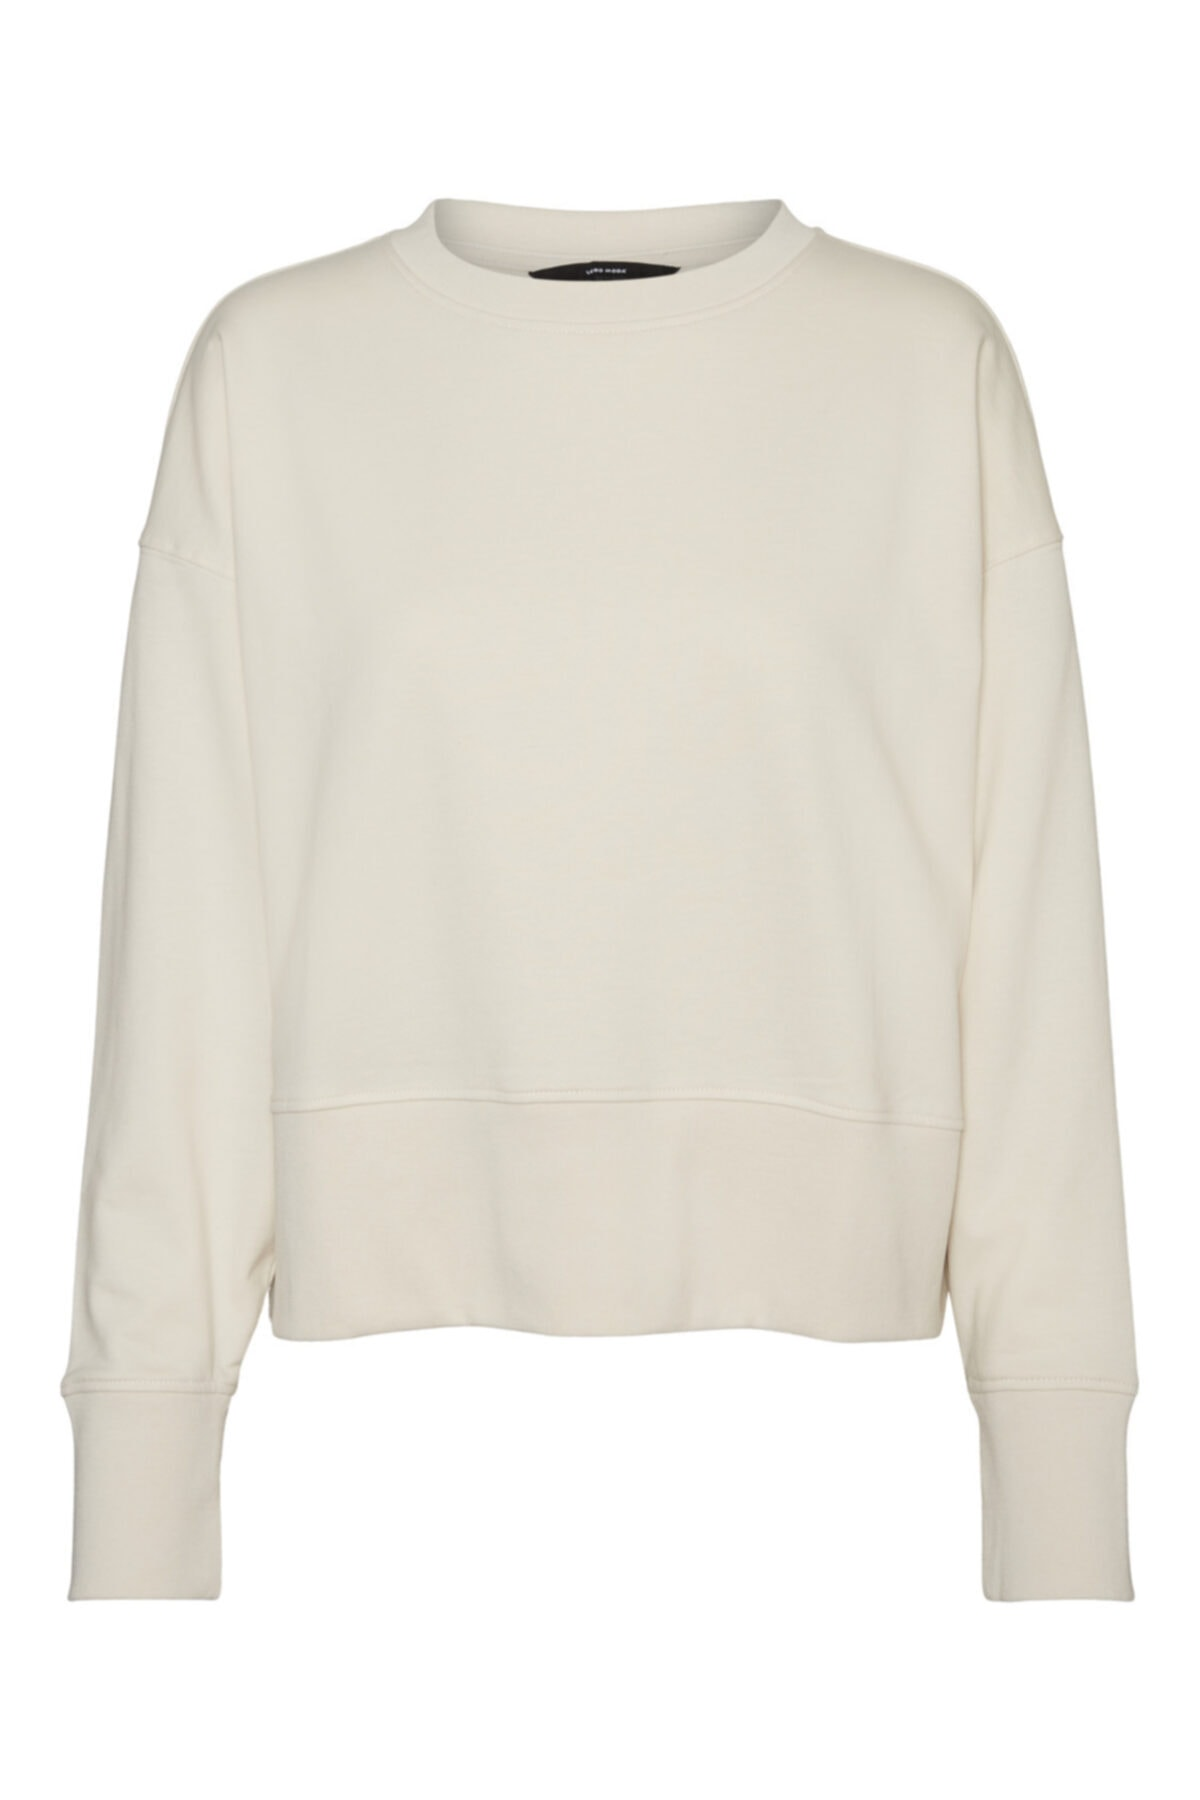 Vero Moda Bol Kesim Sweatshirt 10241392 Vmlenka 2